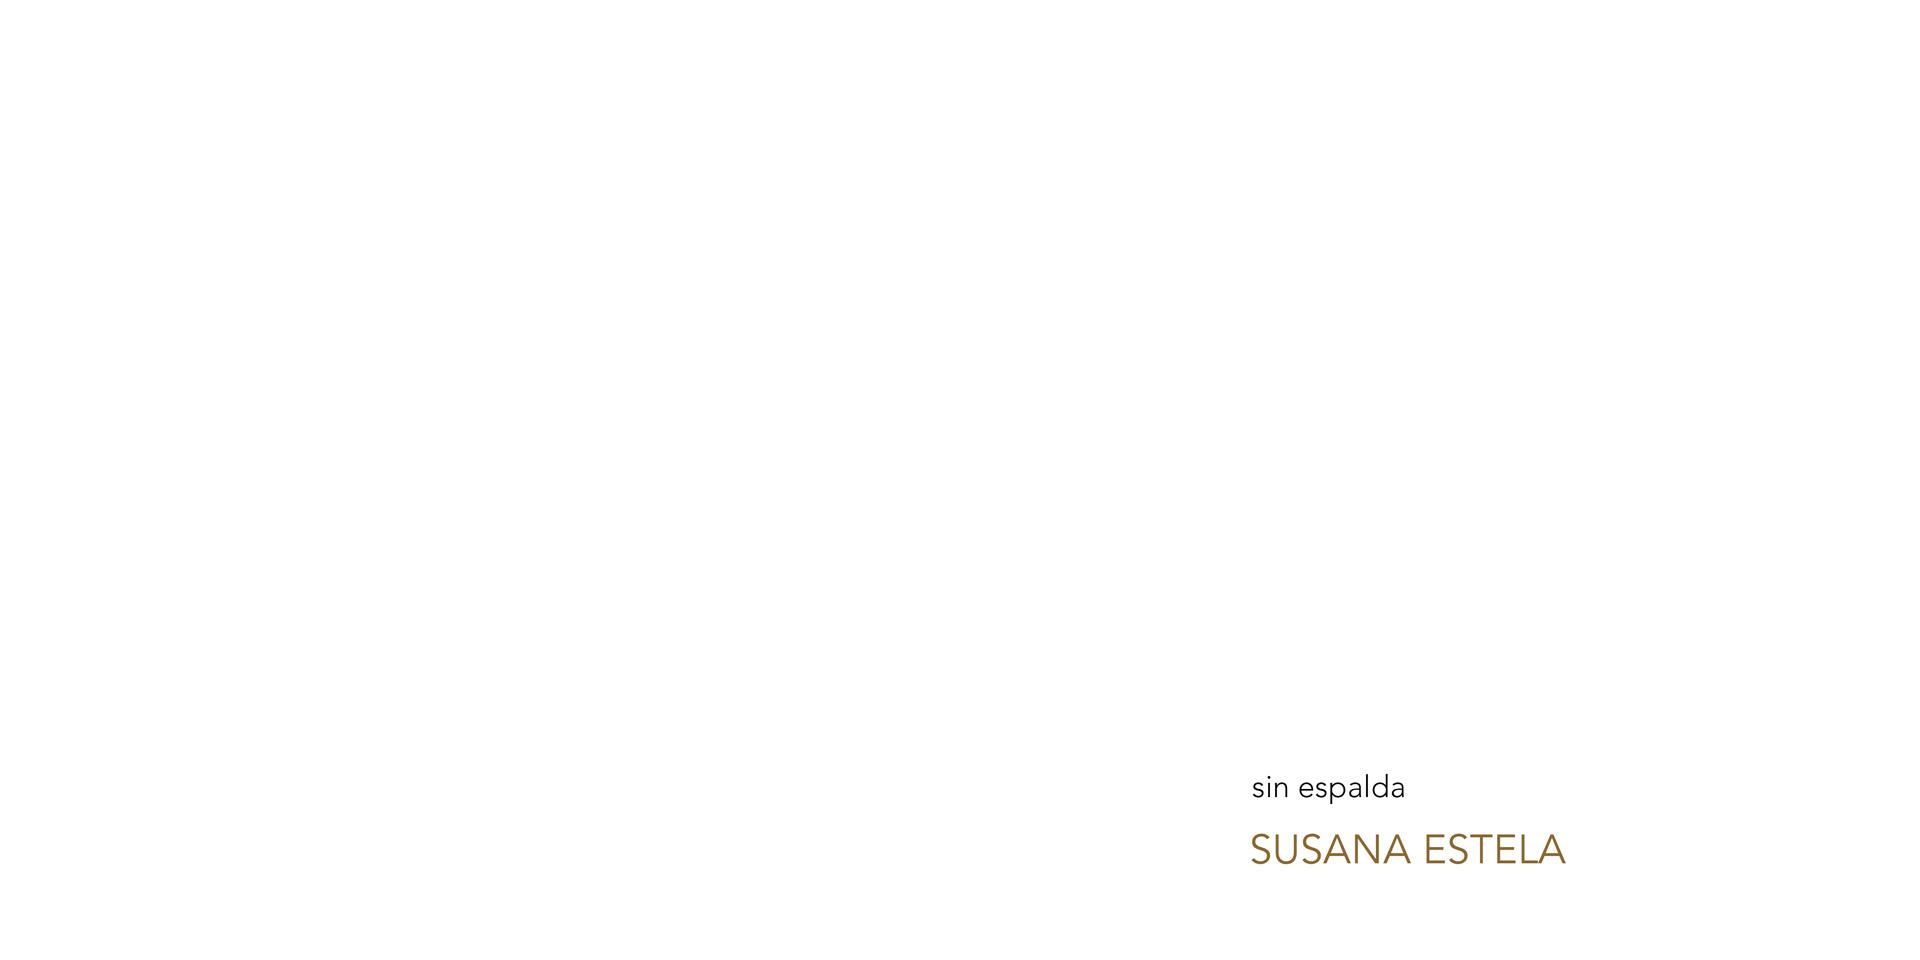 susana-estela-01